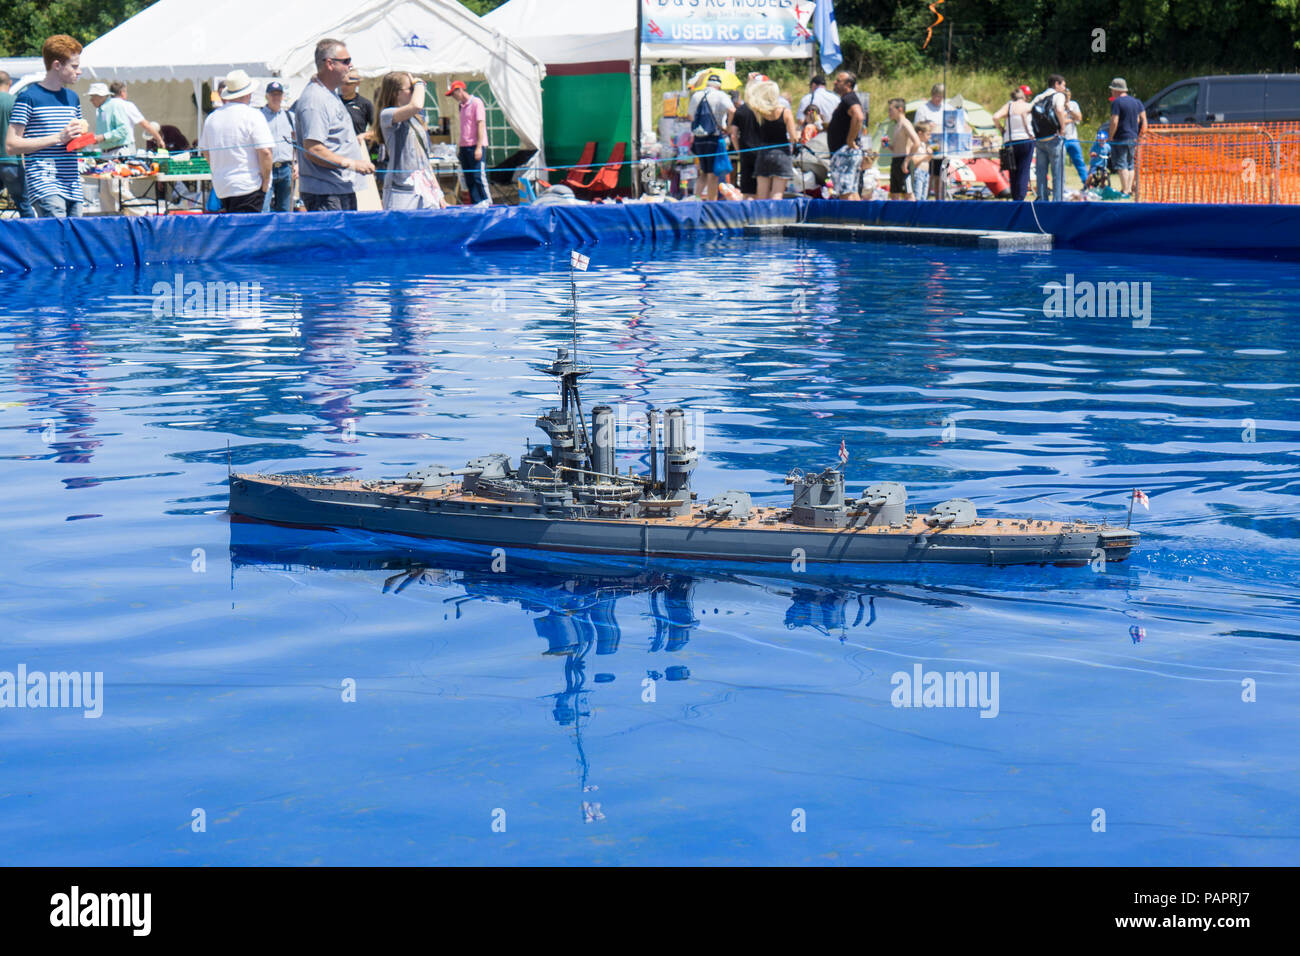 Model of Iron Duke WW1 battleship on pool at Wings and Wheels - Stock Image